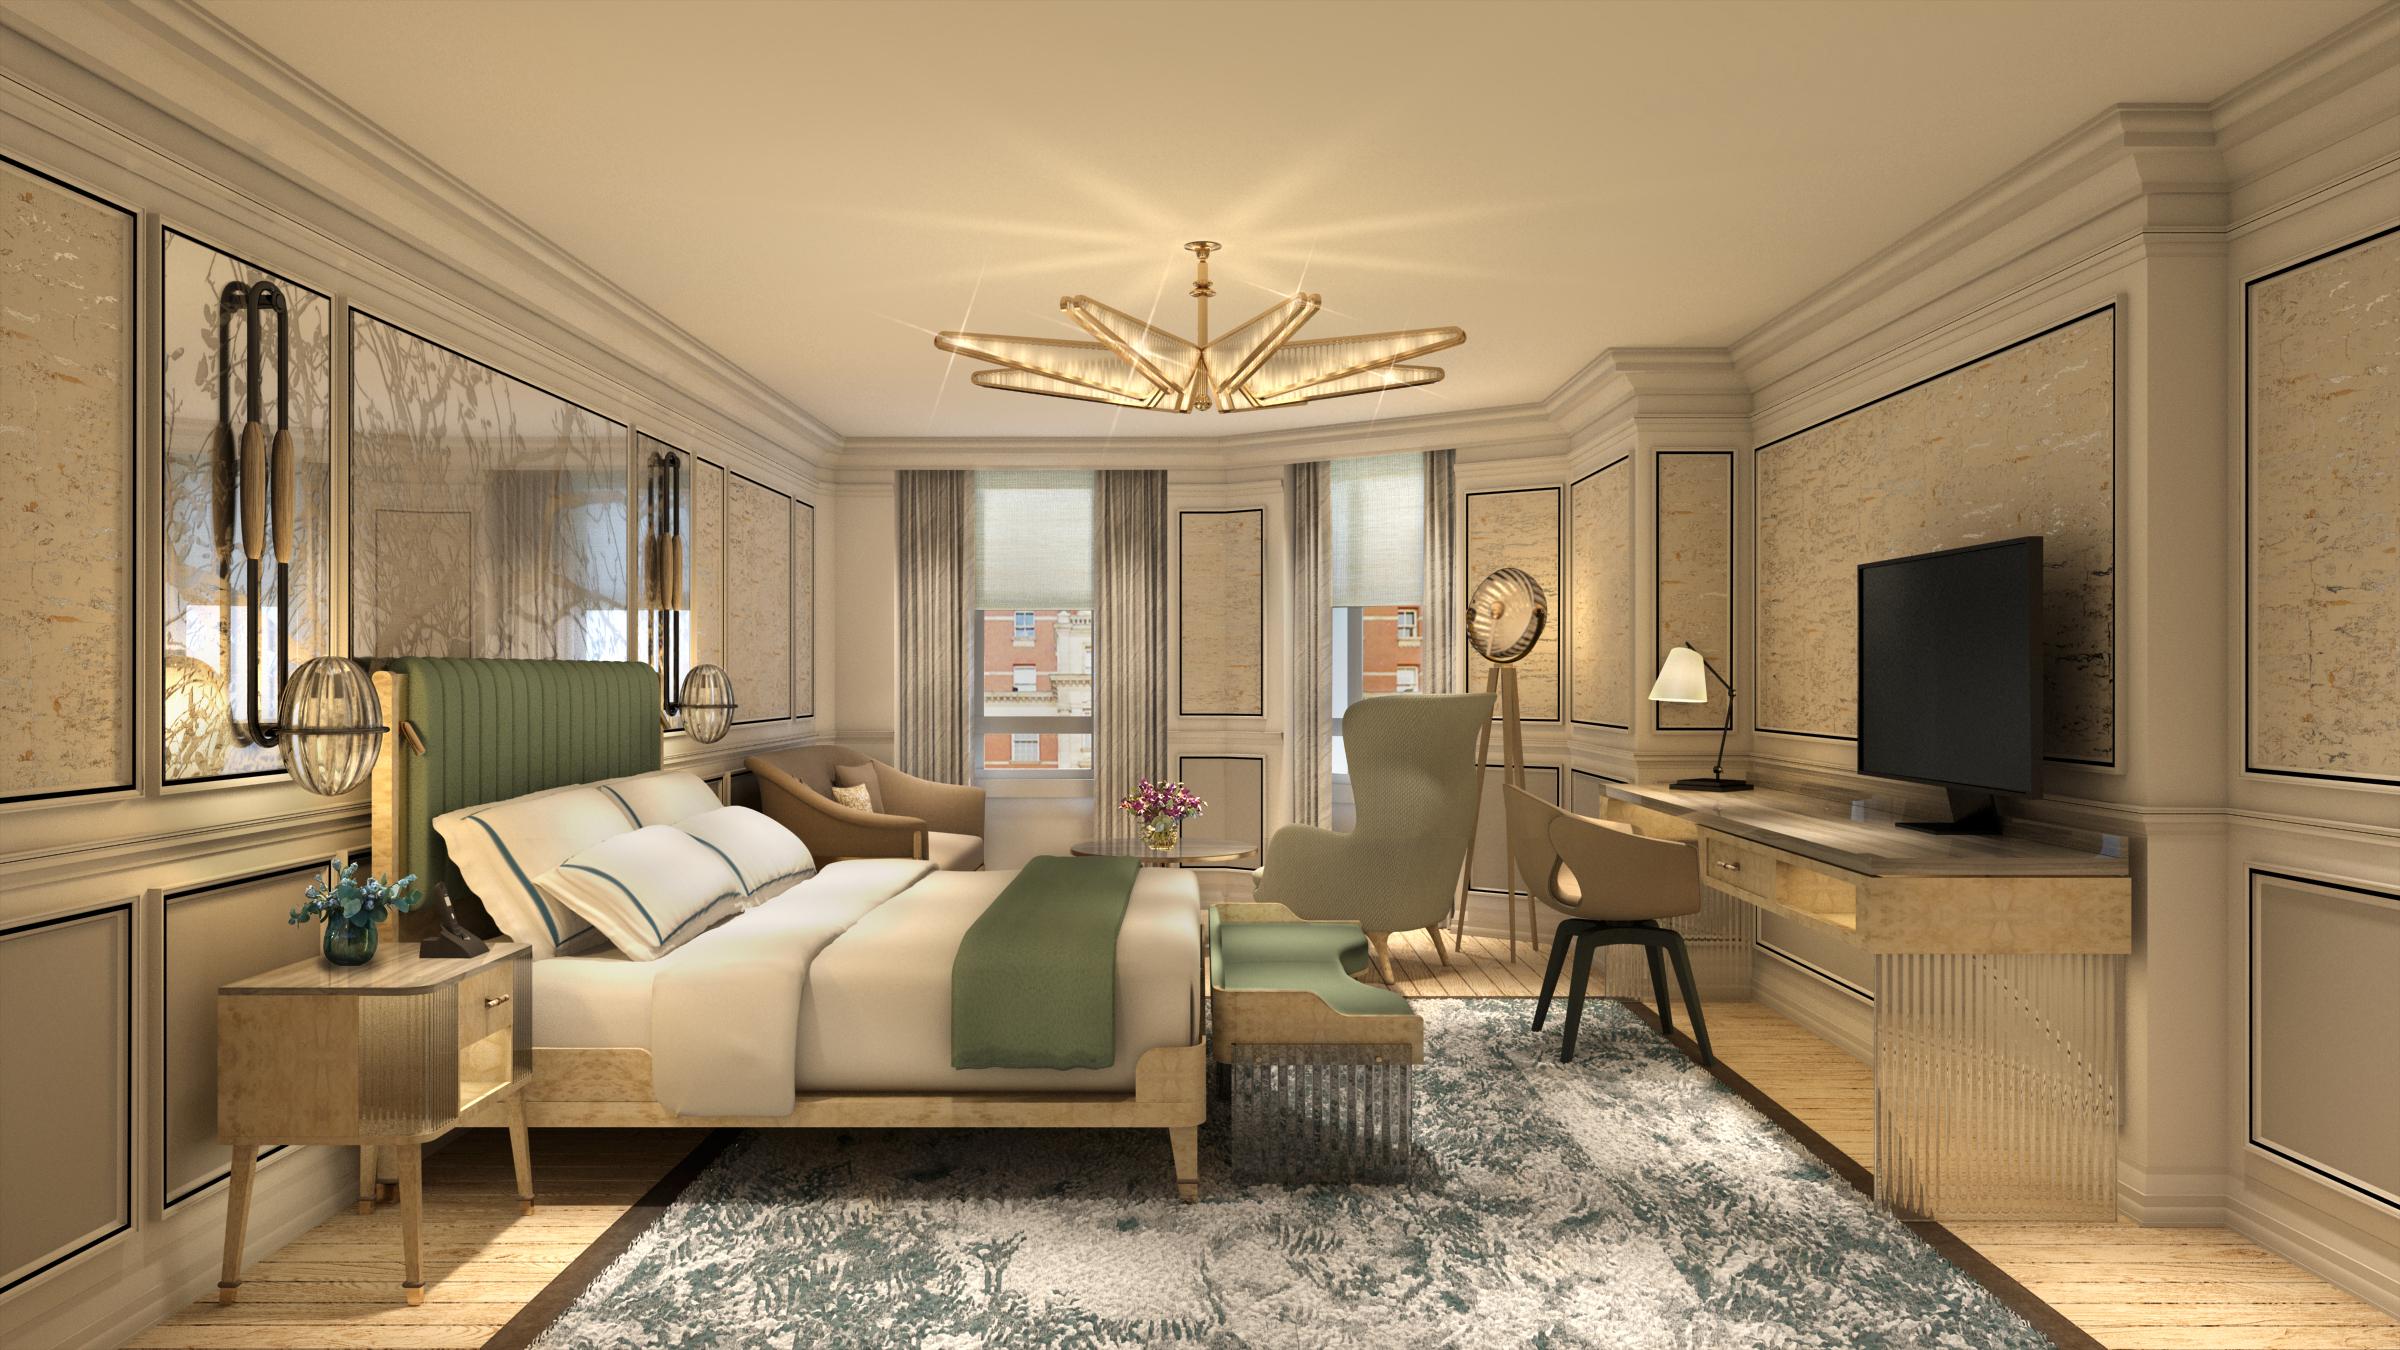 Photo: Courtesy Mandarin Oriental Hyde Park interior of the Knightsbridge bedroom